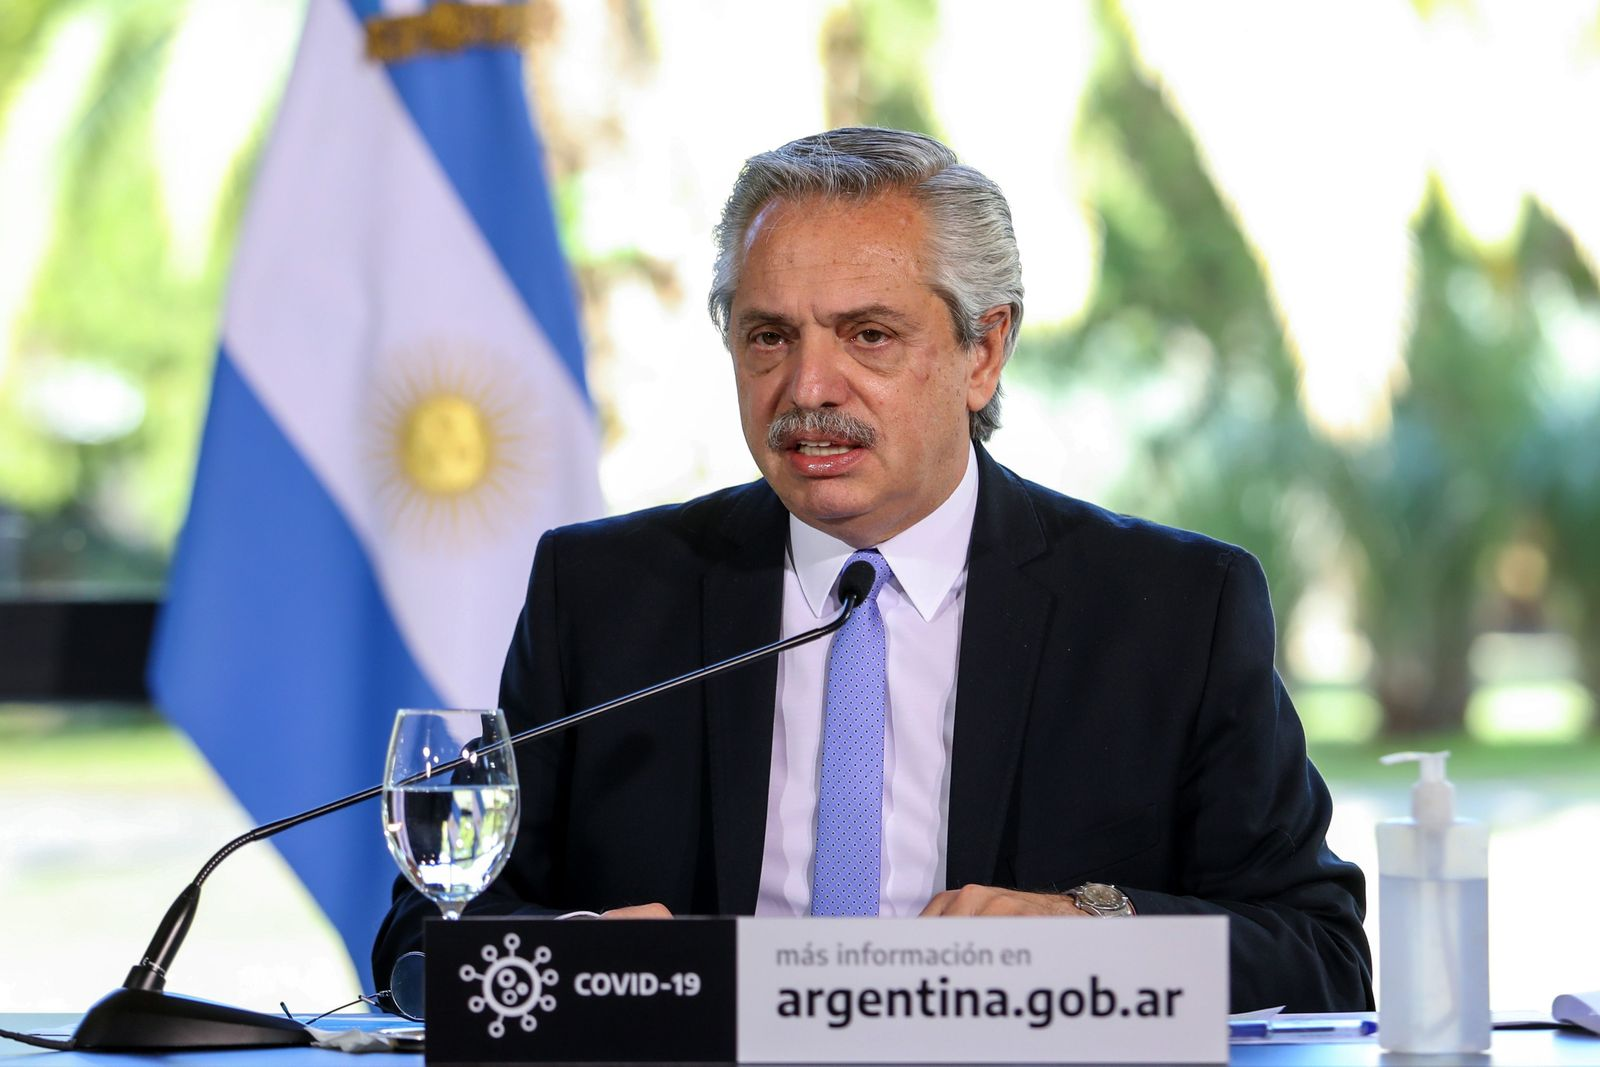 FILES-ARGENTINA-ECONOMY-DEBT-FERNANDEZ